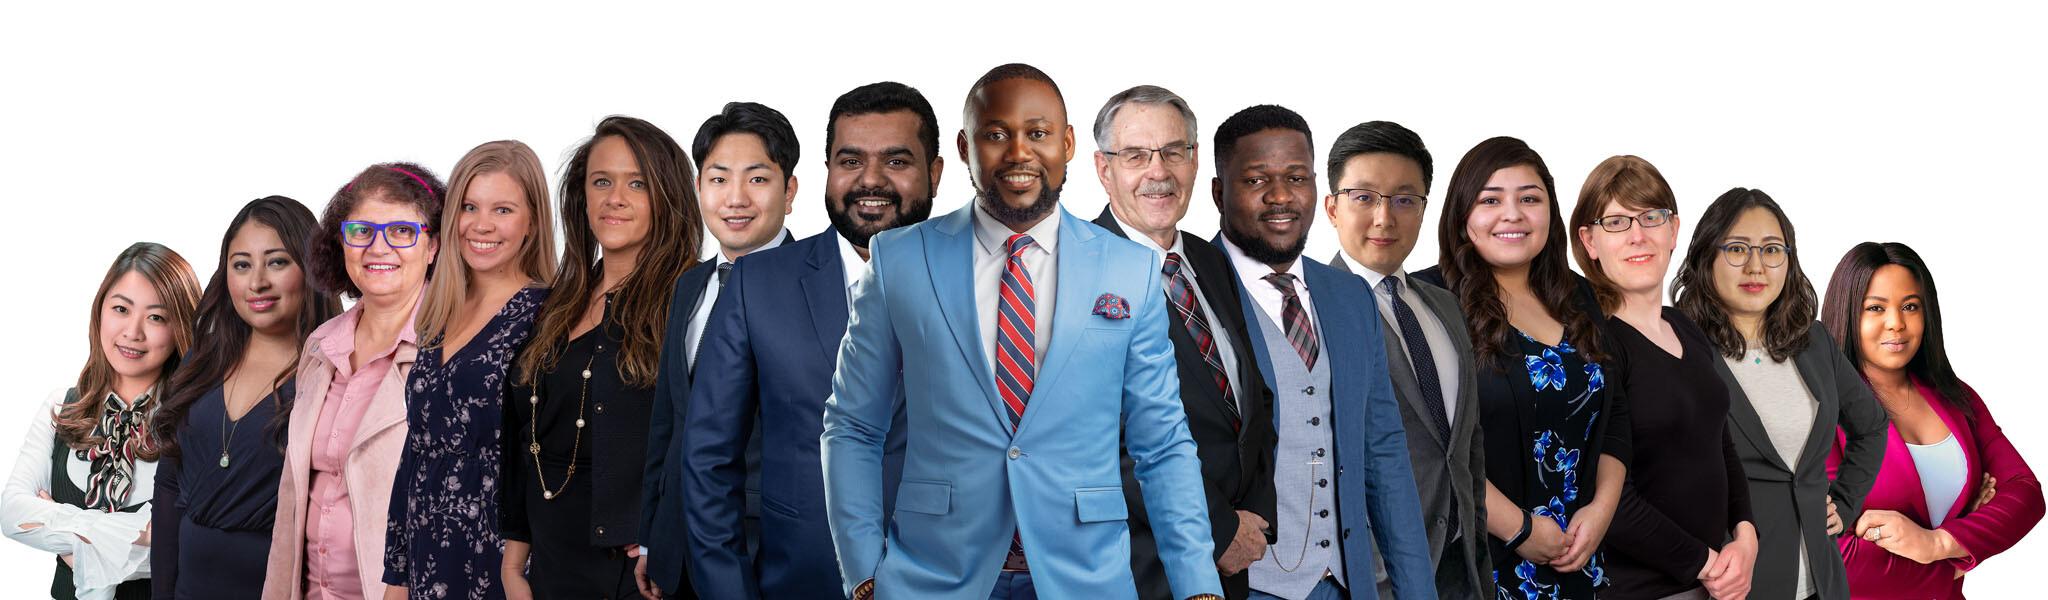 lawyers_in_Calgary_Alberta_Team_2021_Osuji_and_Smith_Lawyers